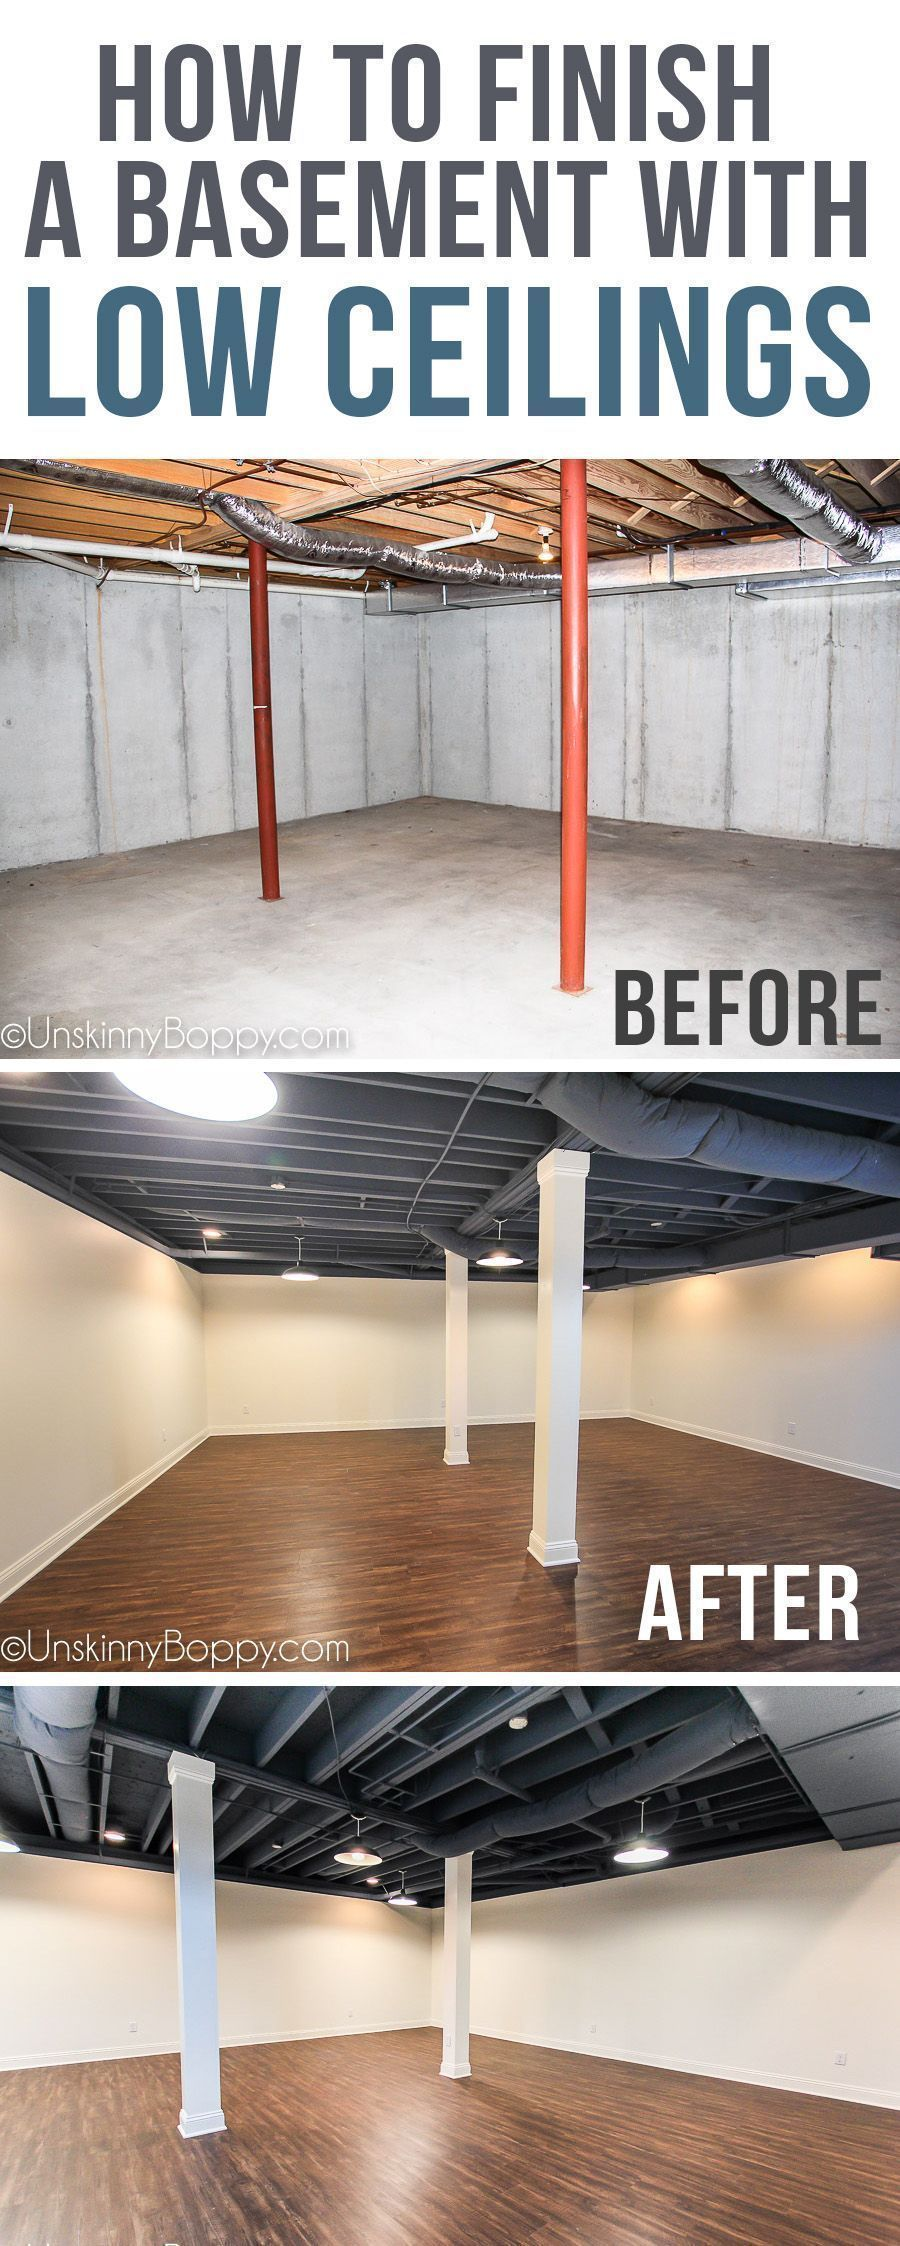 Amazing Unfinished Basement Ideas You Should Try Tags Unfinished Basement Ideas On A Budget How T Basement Ceiling Painted Basement Design Basement Remodeling